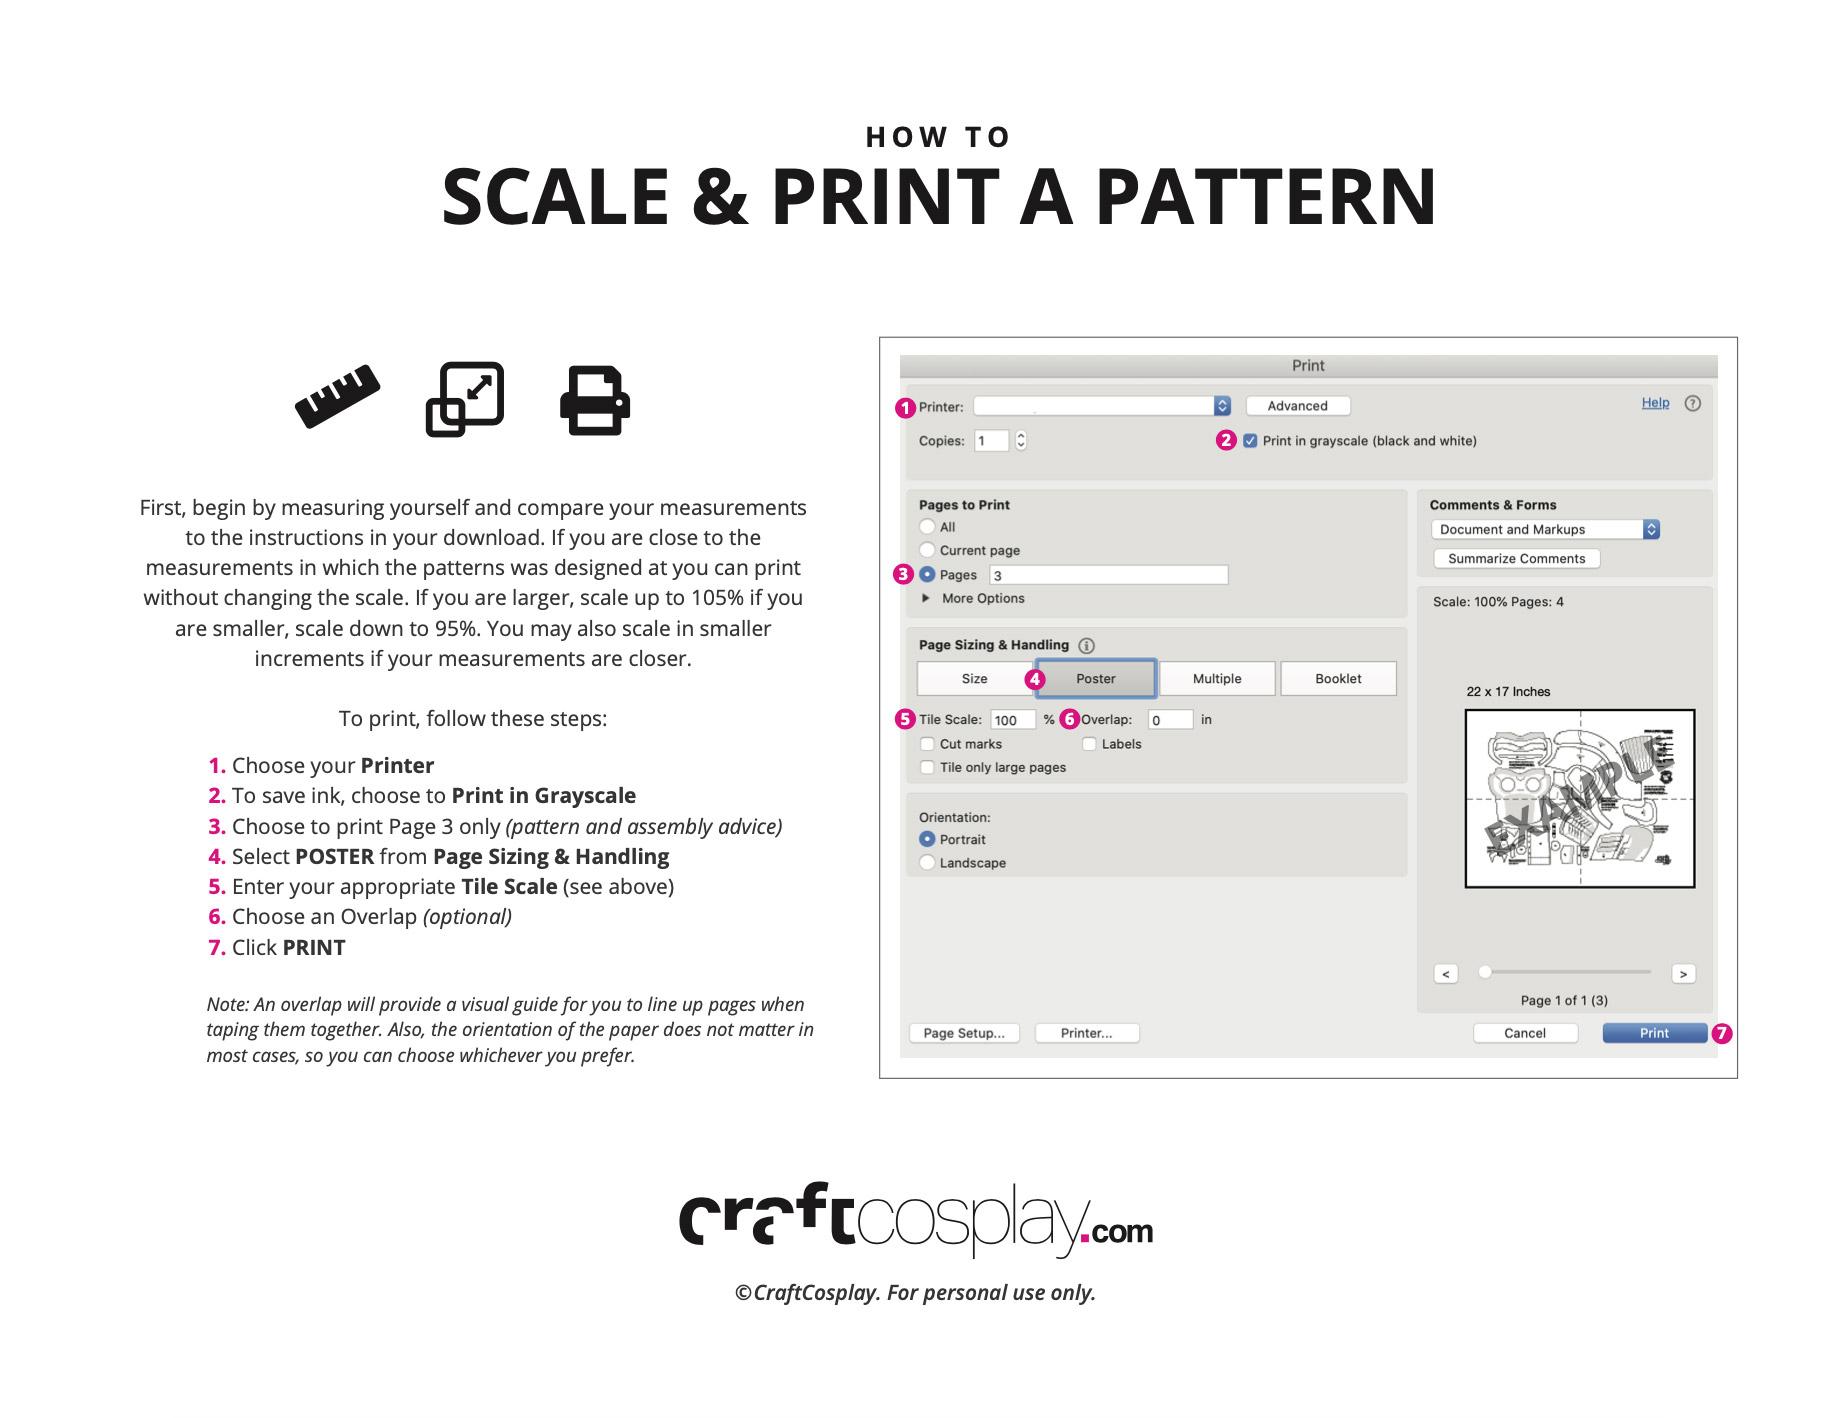 Scale & Print Guide